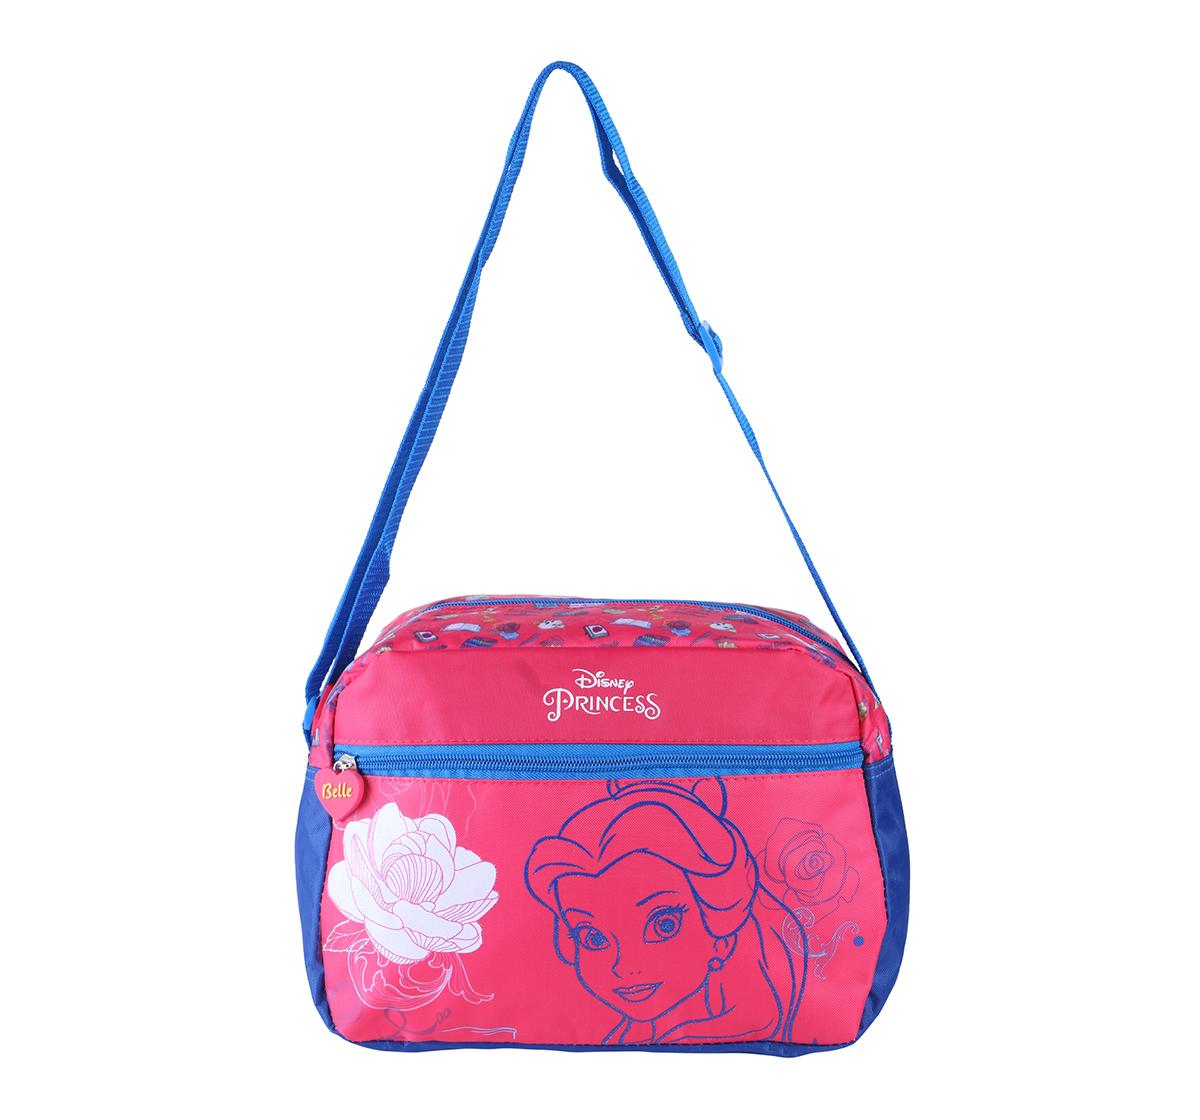 Disney | Disney Princess - Utility Bag Travel for Girls age 3Y+ (Light Pink)